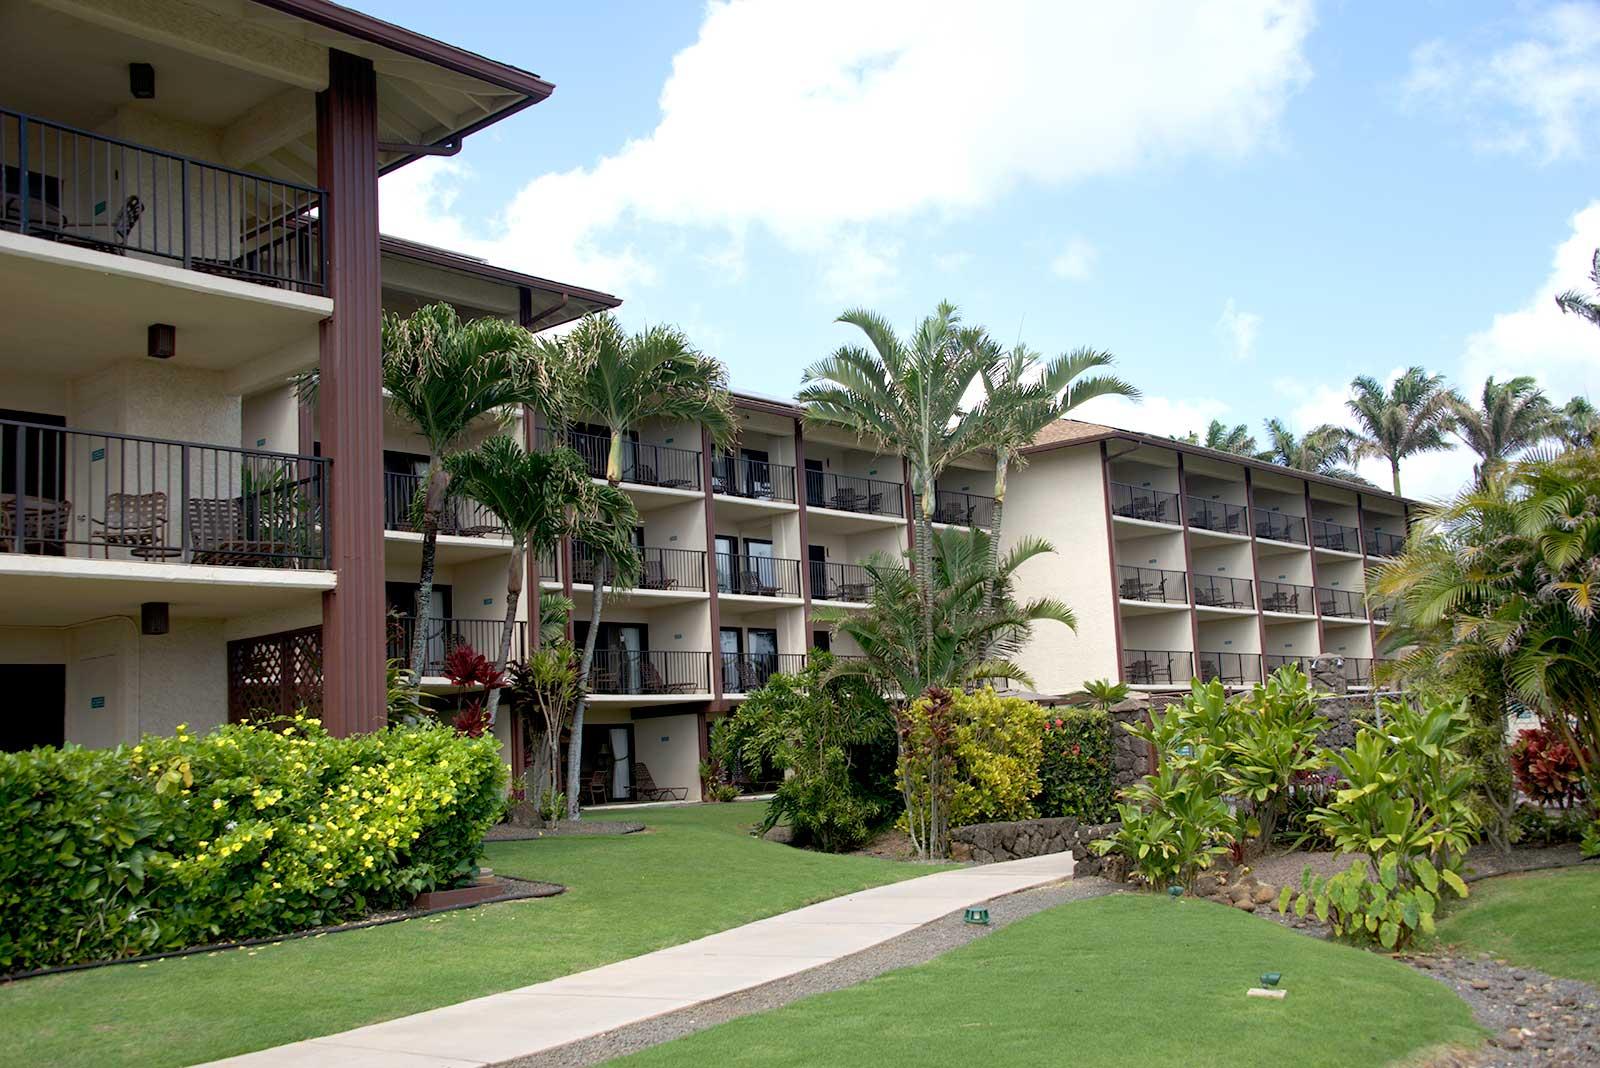 Lawai-Beach-Resort-Kauai-10